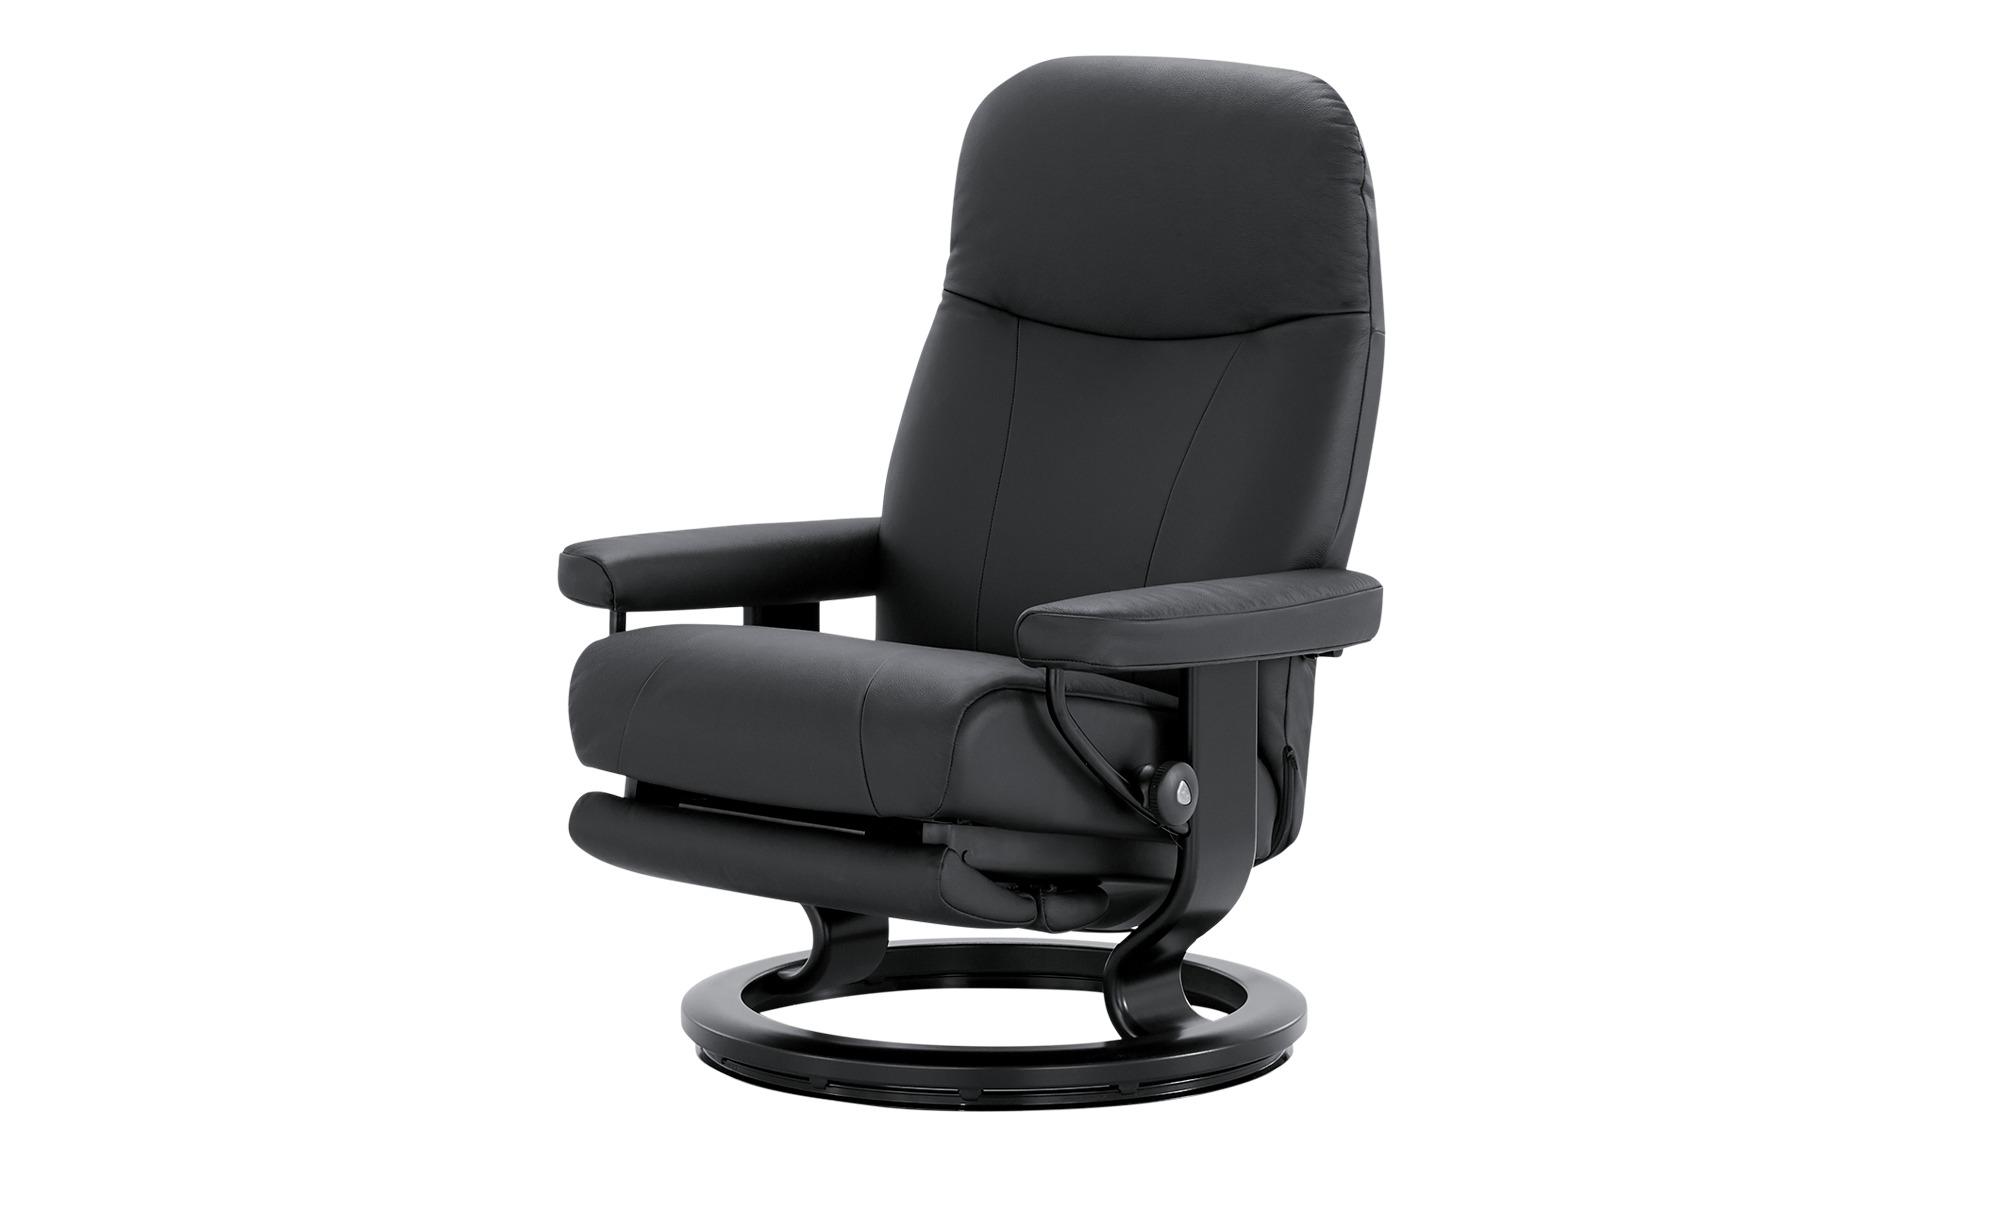 Stressless Sessel mit elektr. Relaxfunktion  Garda M ¦ schwarz ¦ Maße (cm): B: 76 H: 100 T: 71 Polstermöbel > Sessel > Fernsehsessel - Höffner